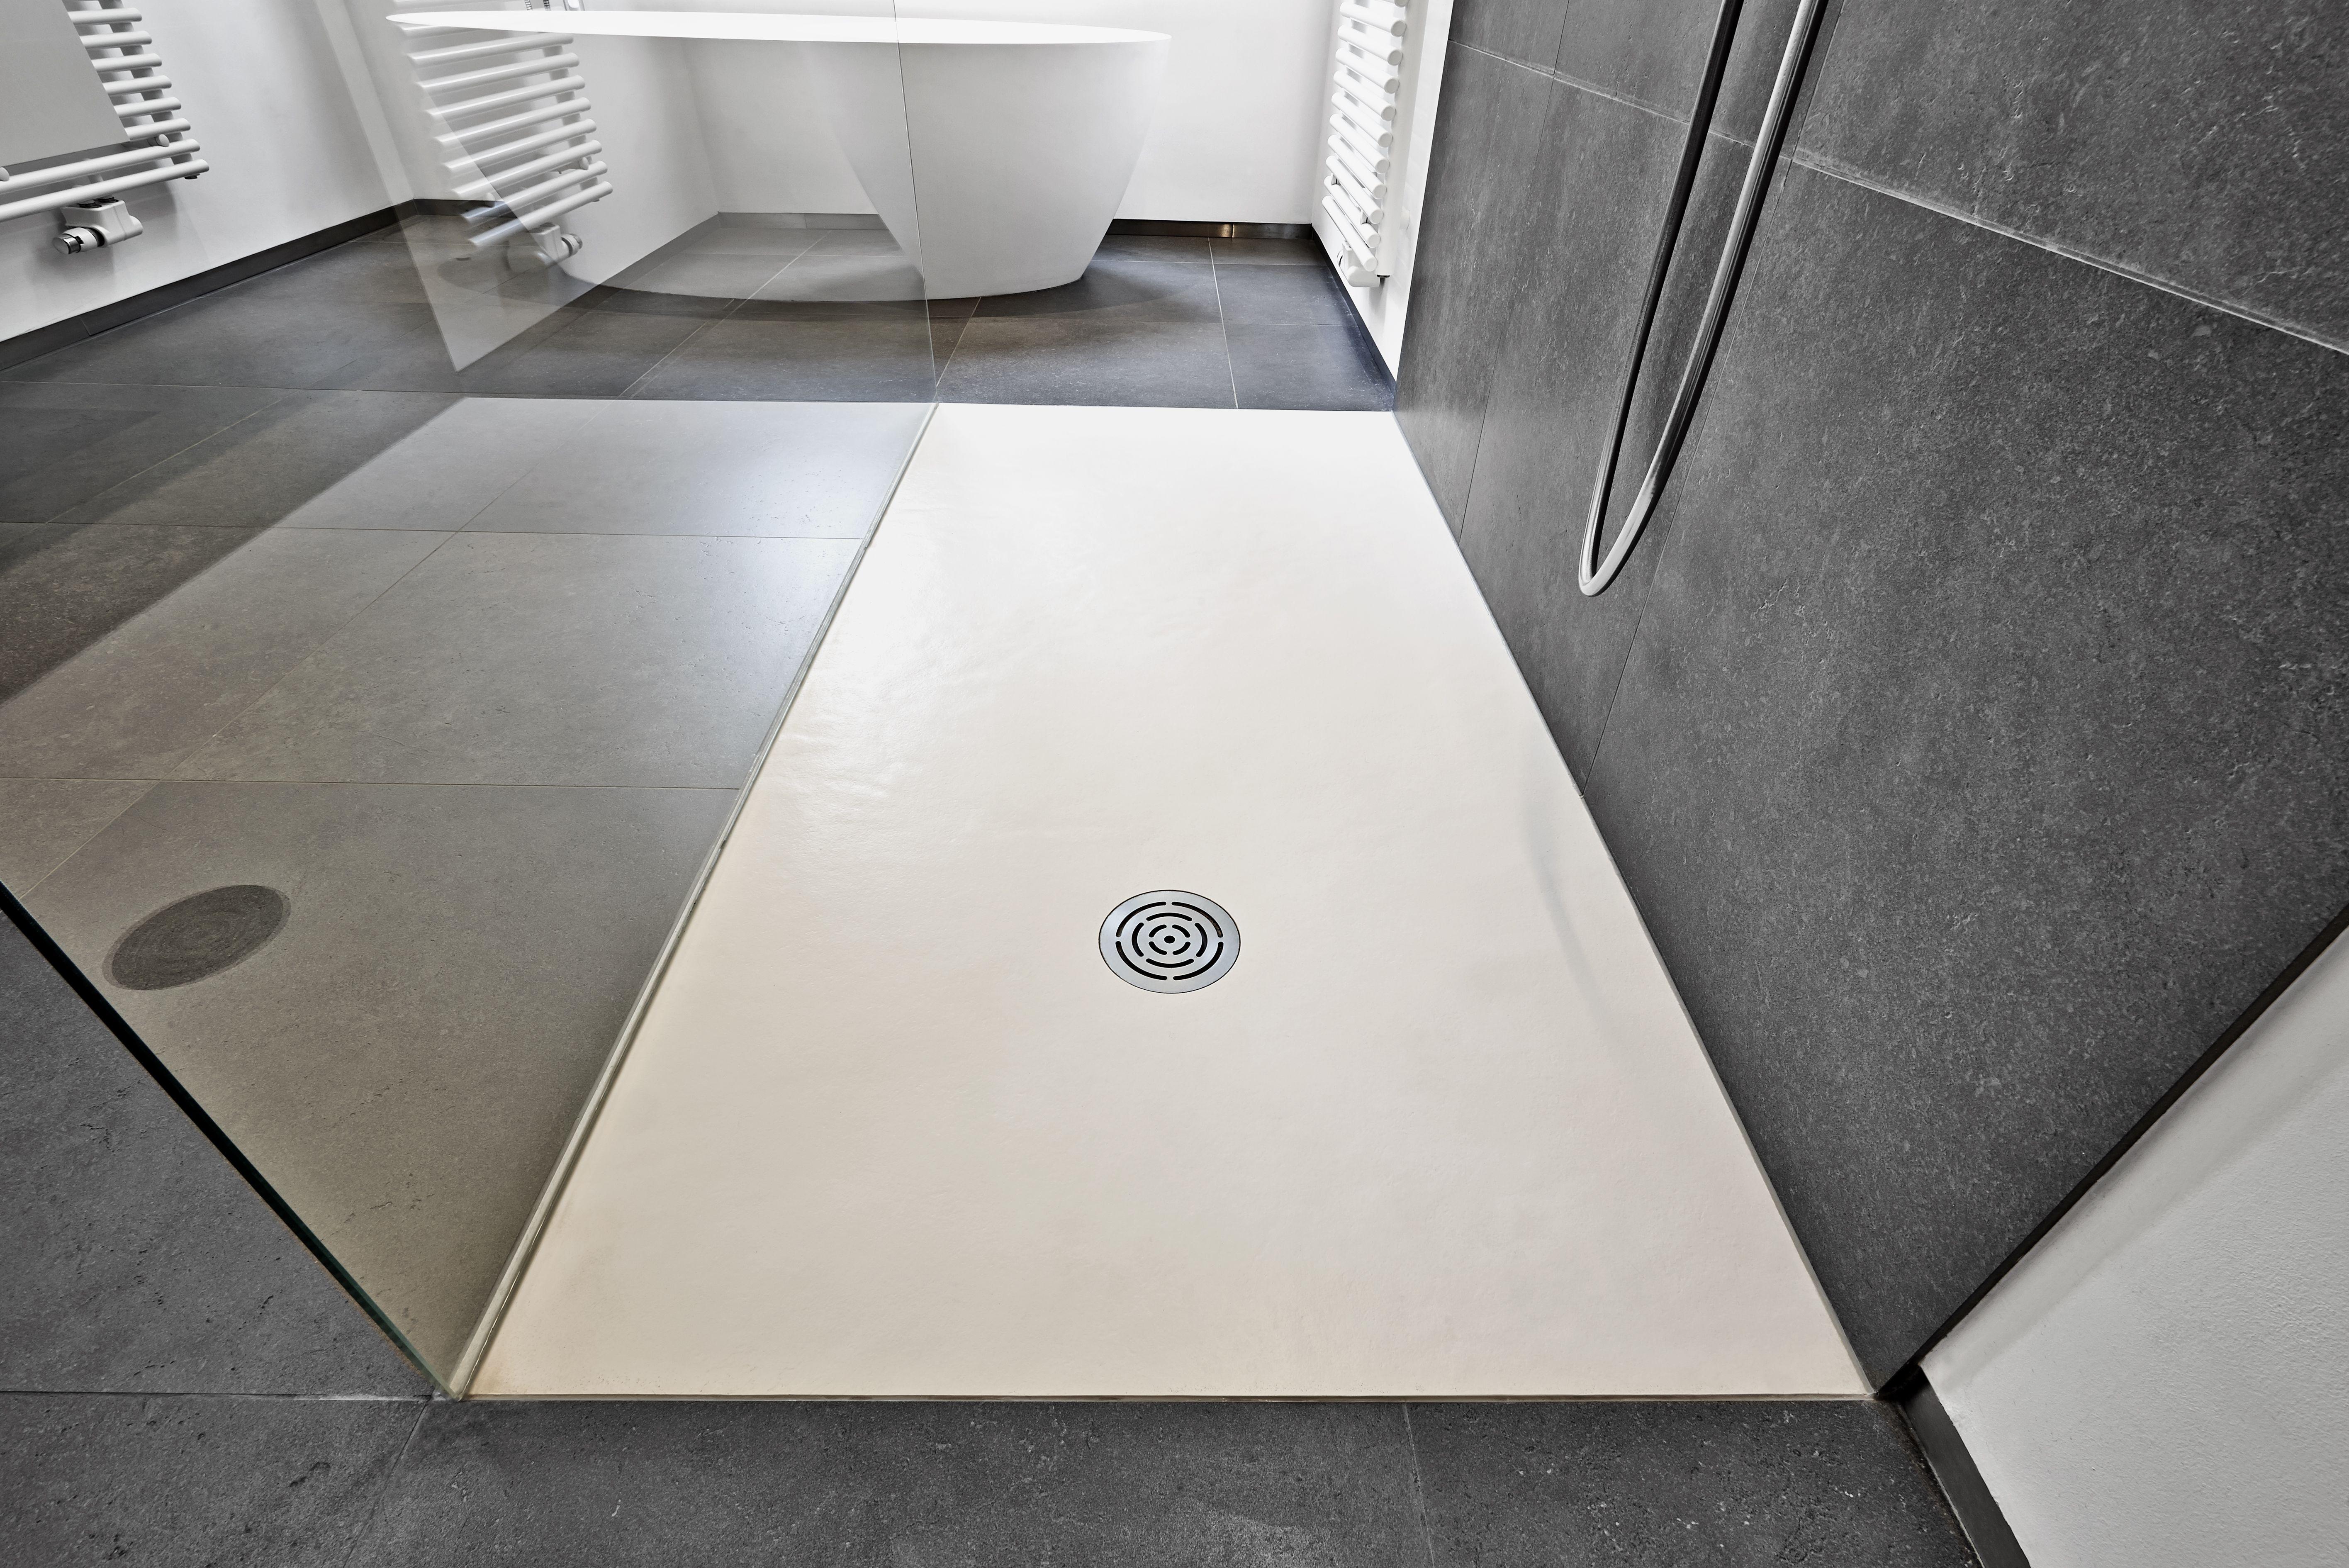 Platos de ducha